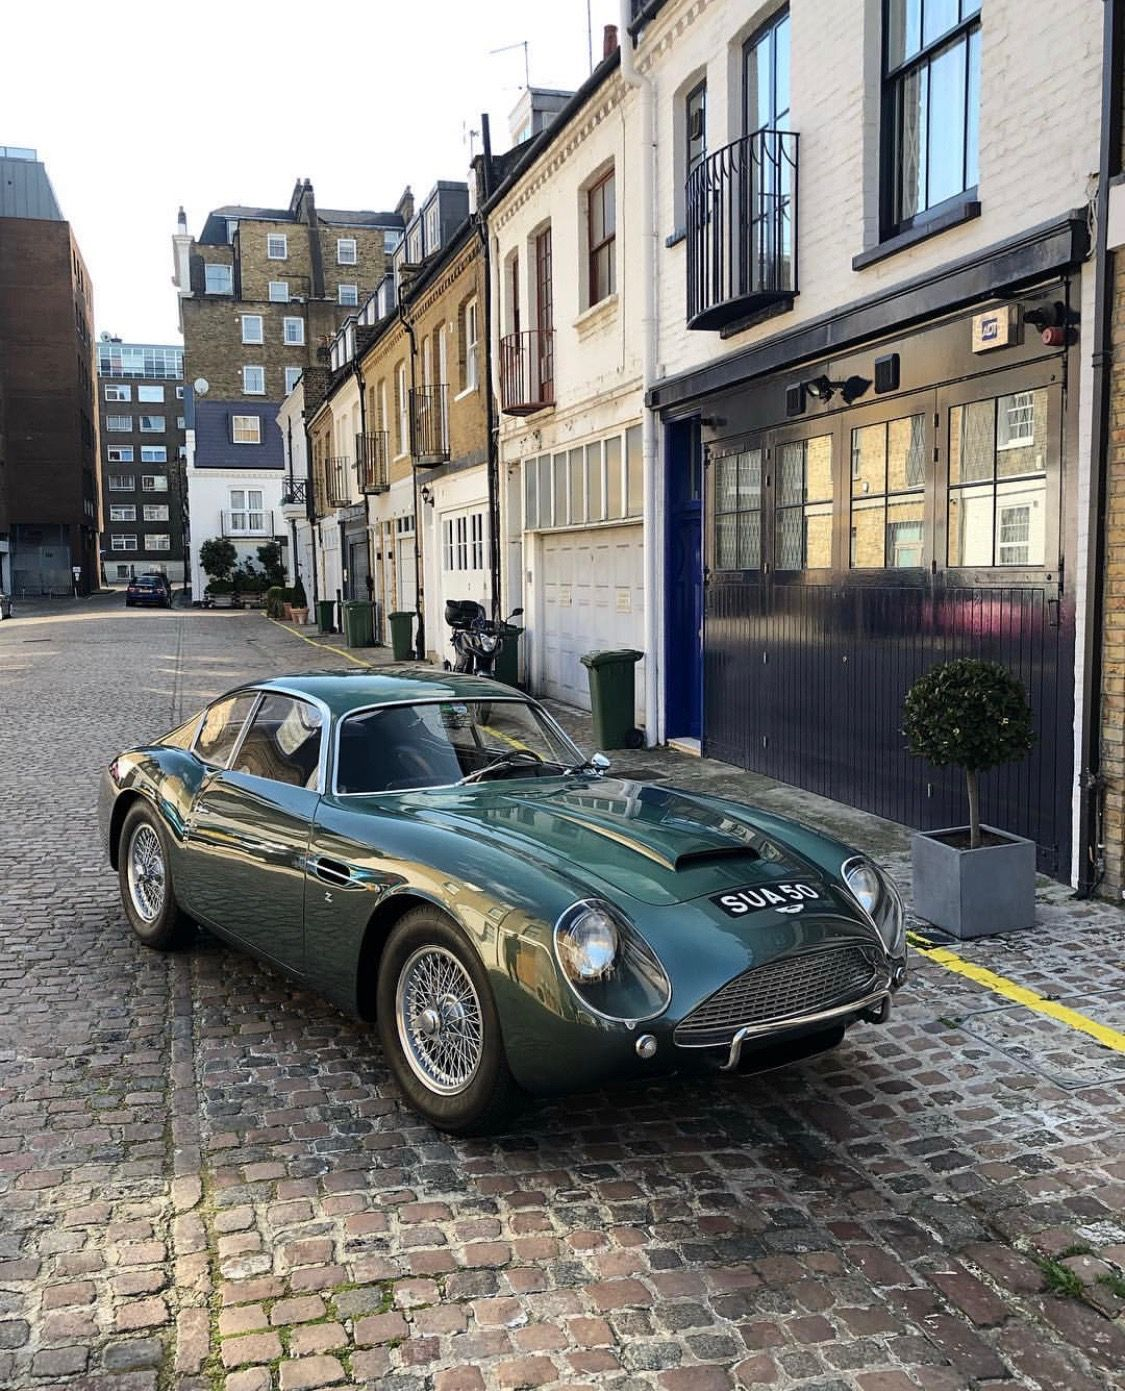 Aston Martin Lagonda: Aston Martin Cars By Pete Maxted On Cars I Should Own